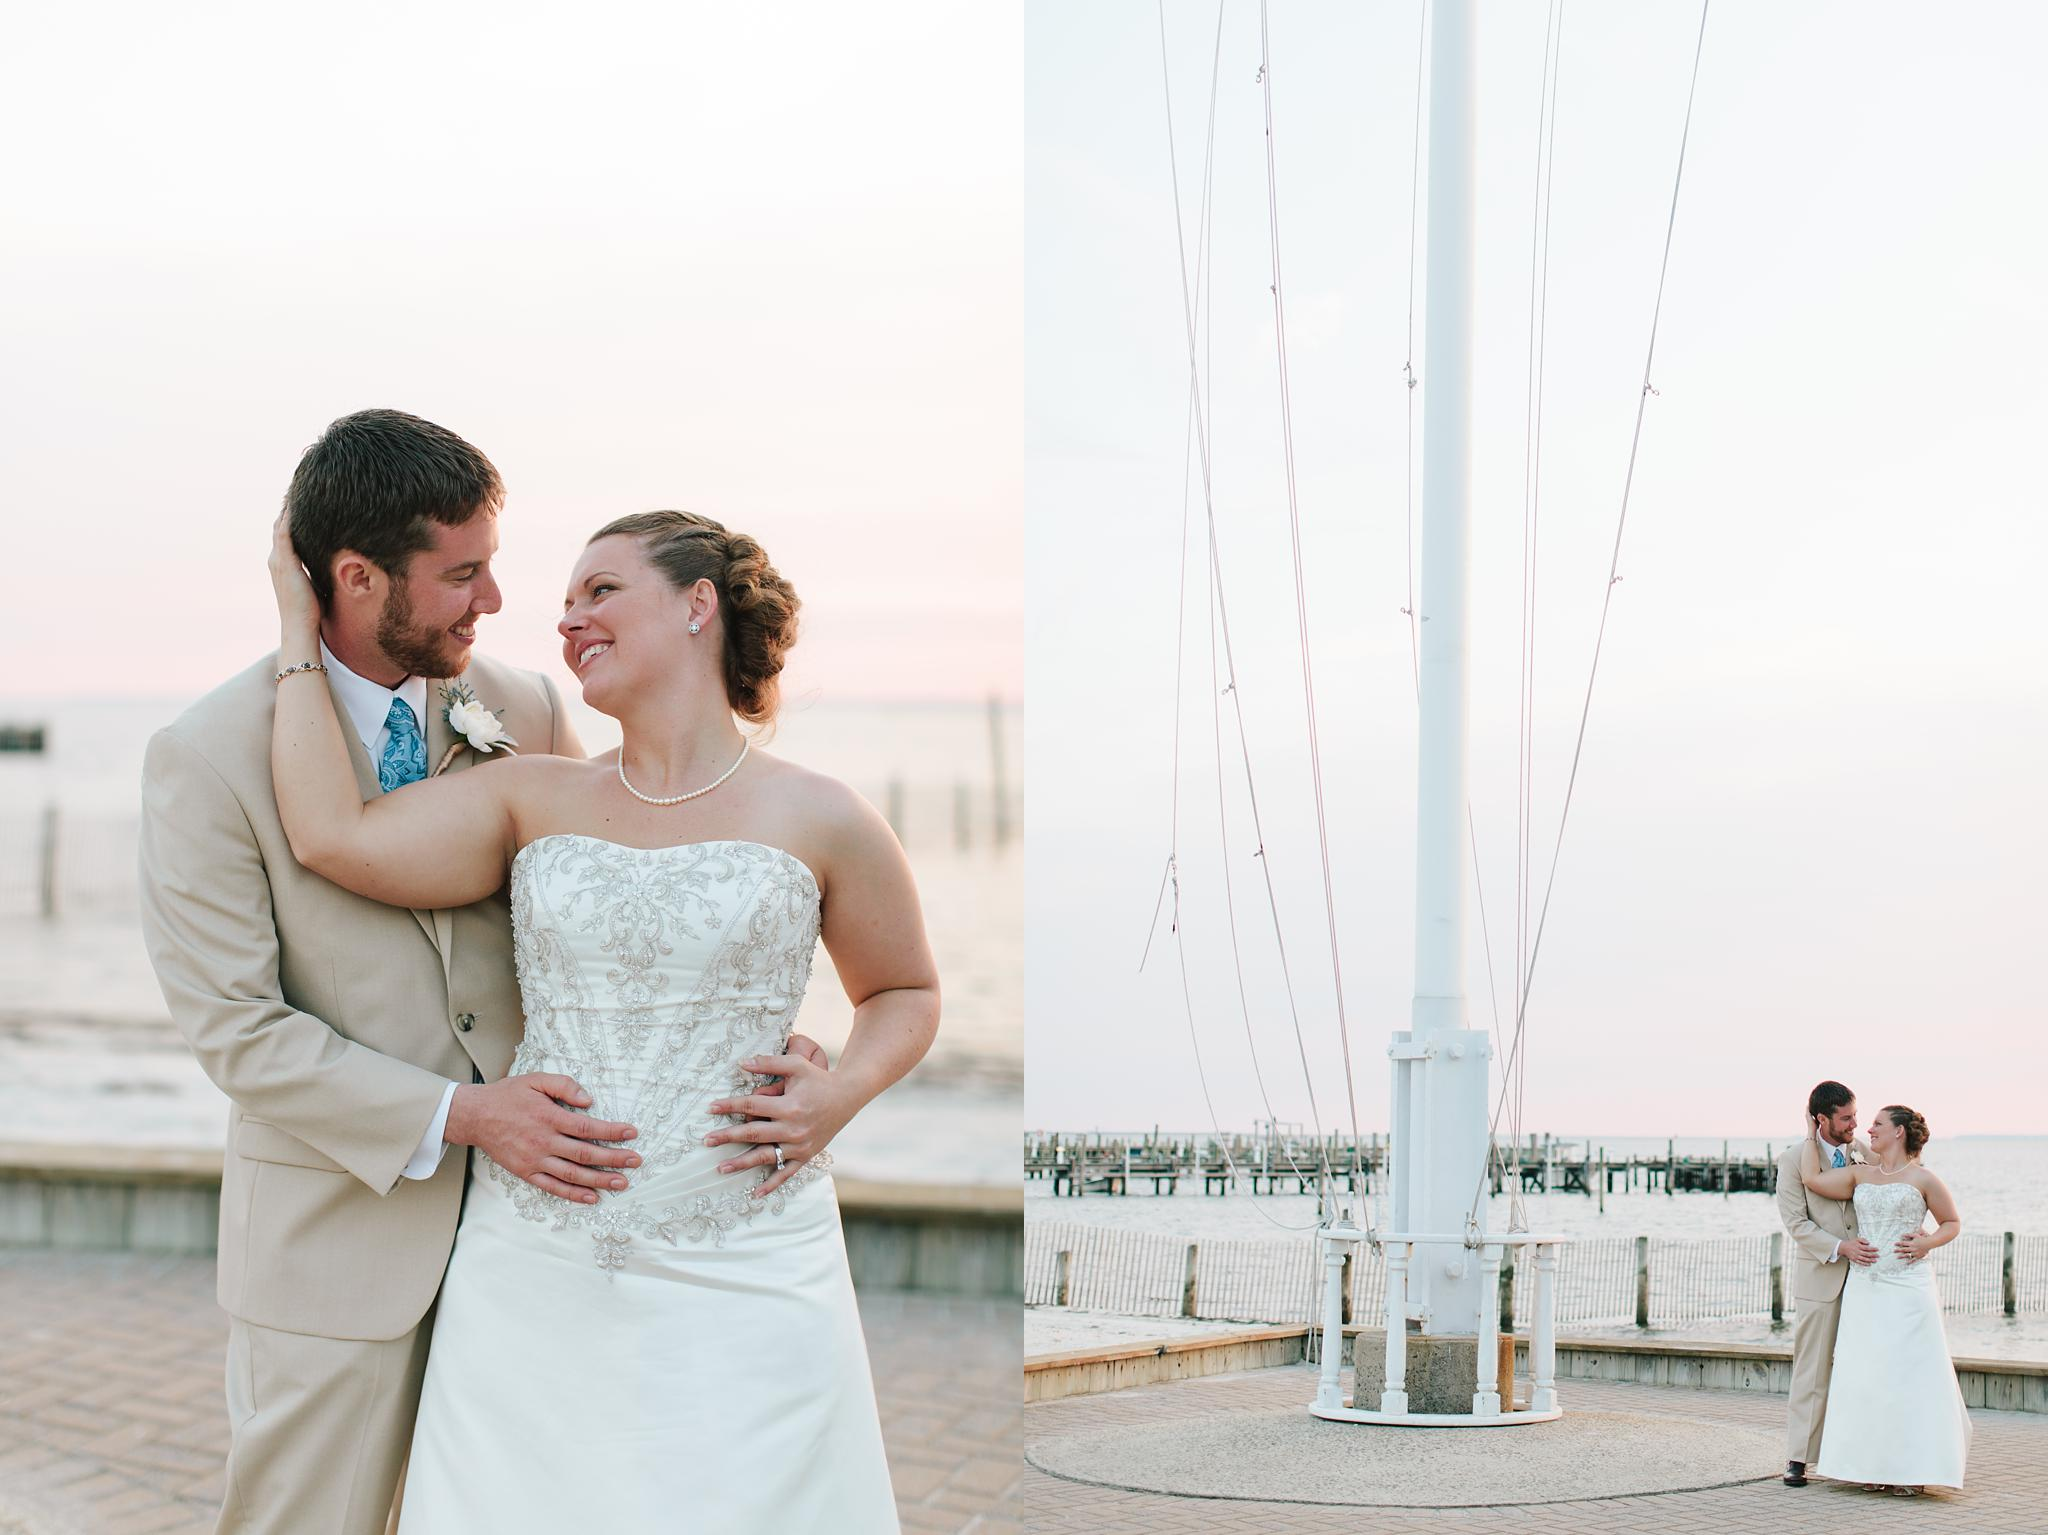 brant_beach_yacht_club_wedding_long_beach_island_nj_wedding_photographer_1094.jpg